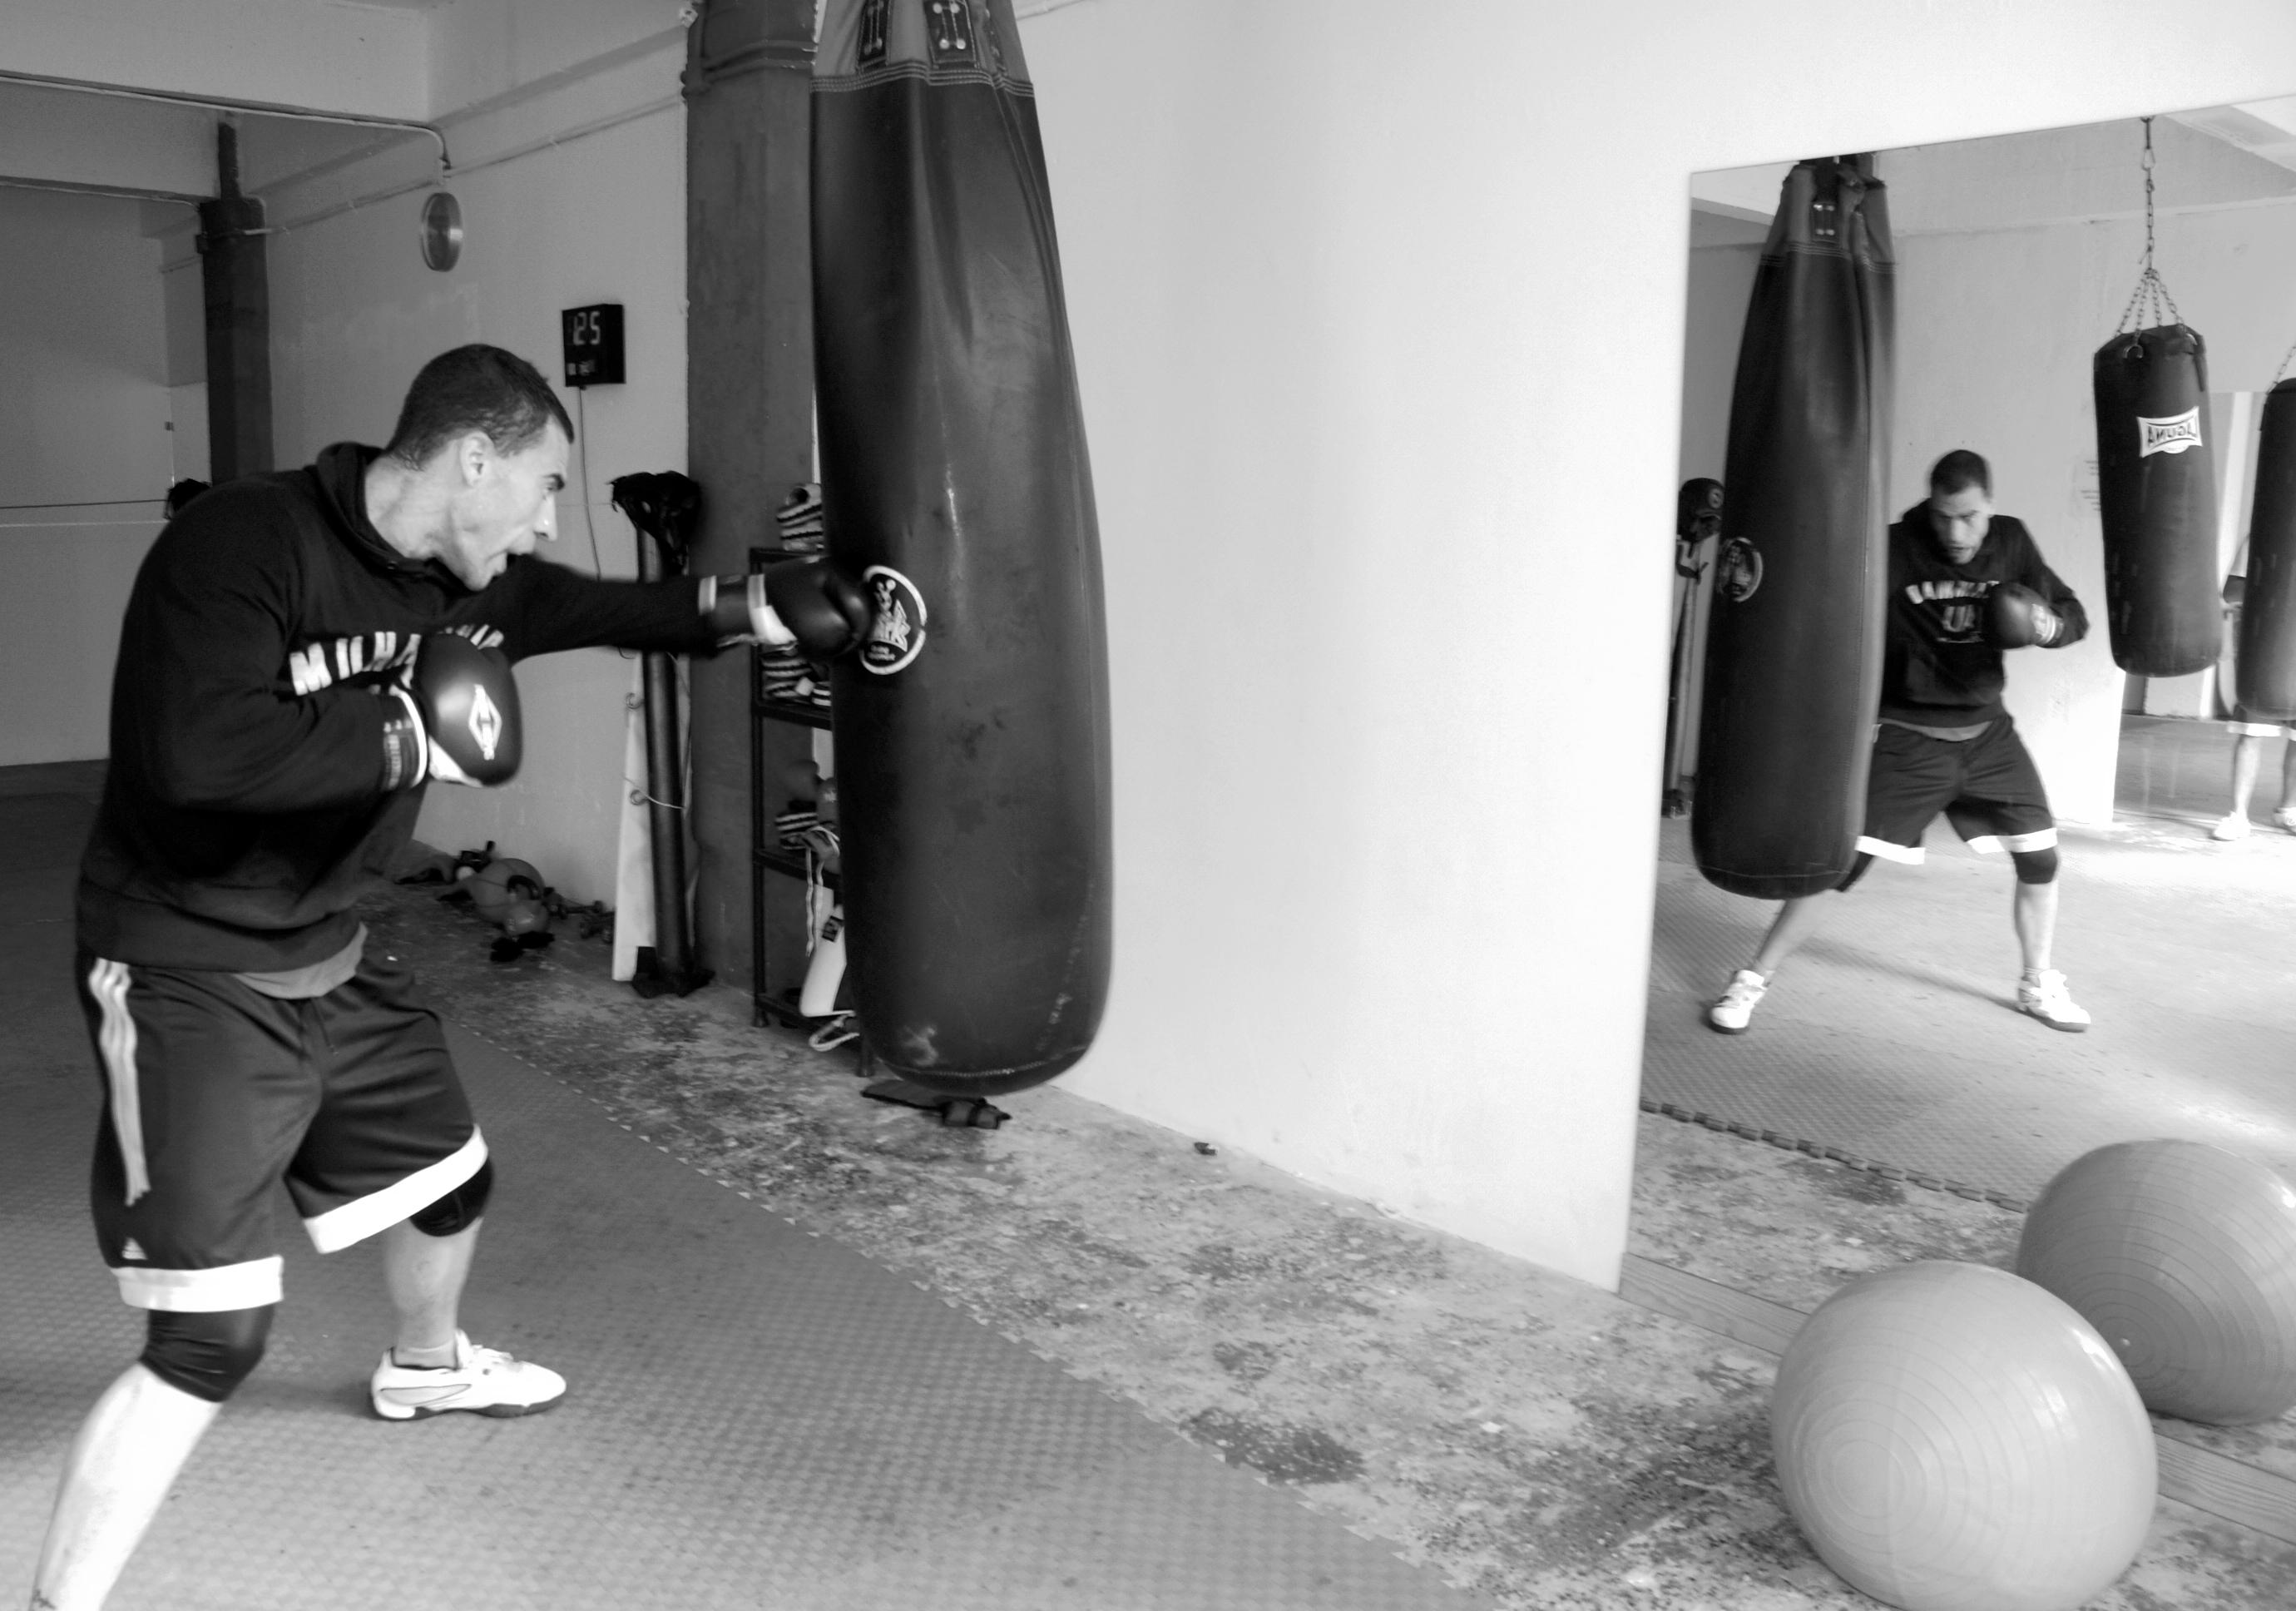 David Larrinaga, boxeo, peso pesado, Bizkaia